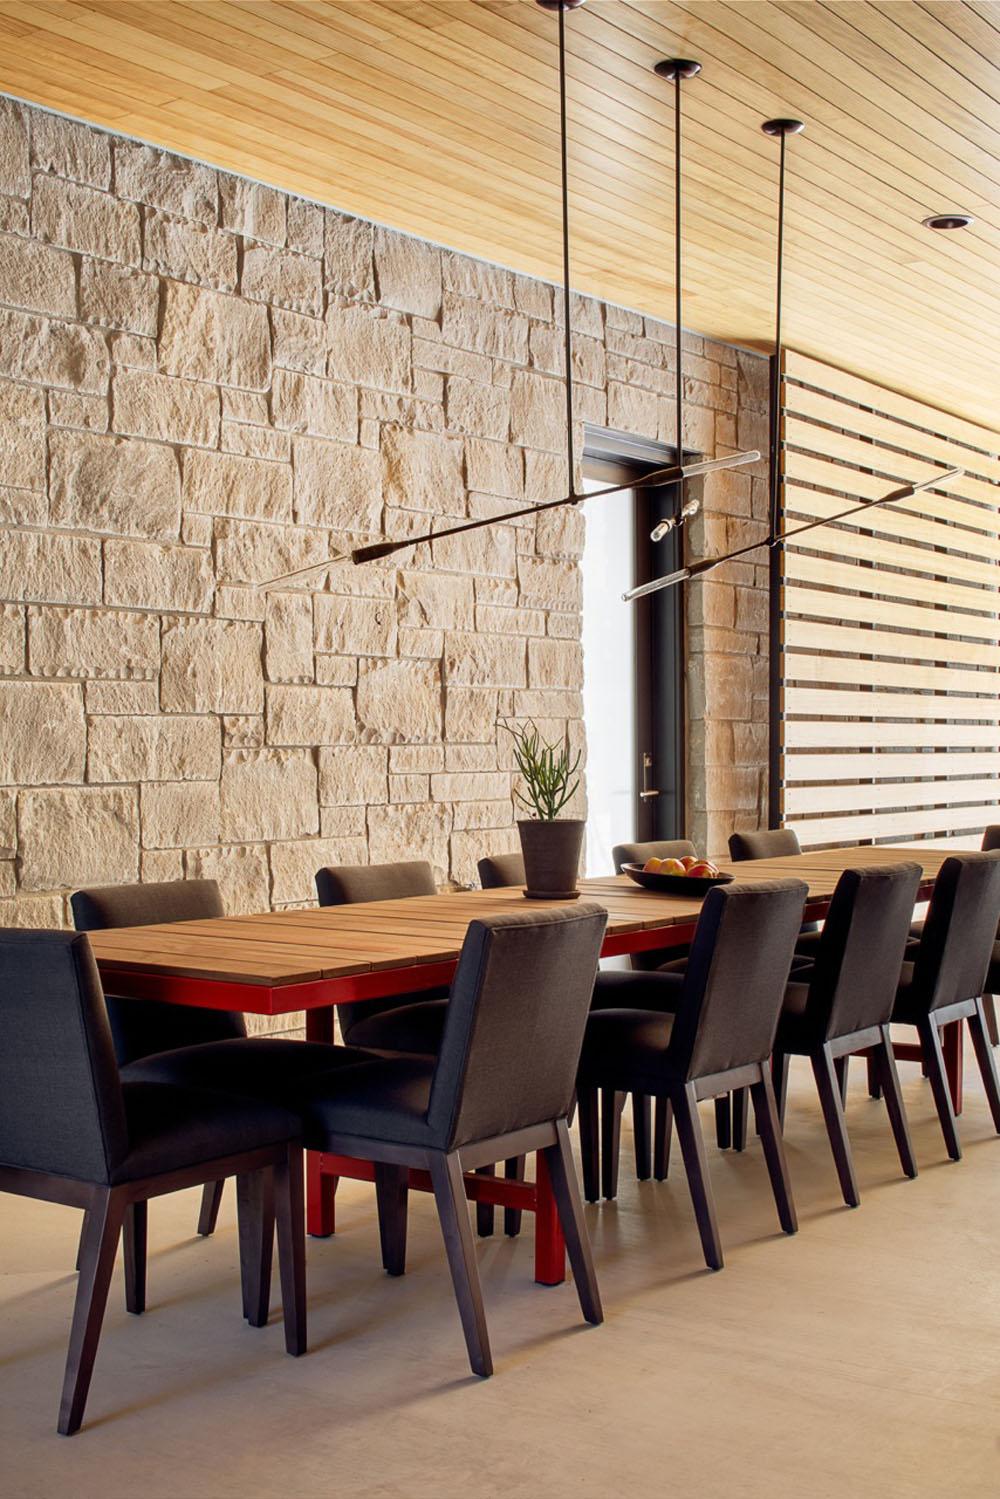 Dise o de casa de un piso con fachada en piedra y madera for Diseno de paredes interiores casas